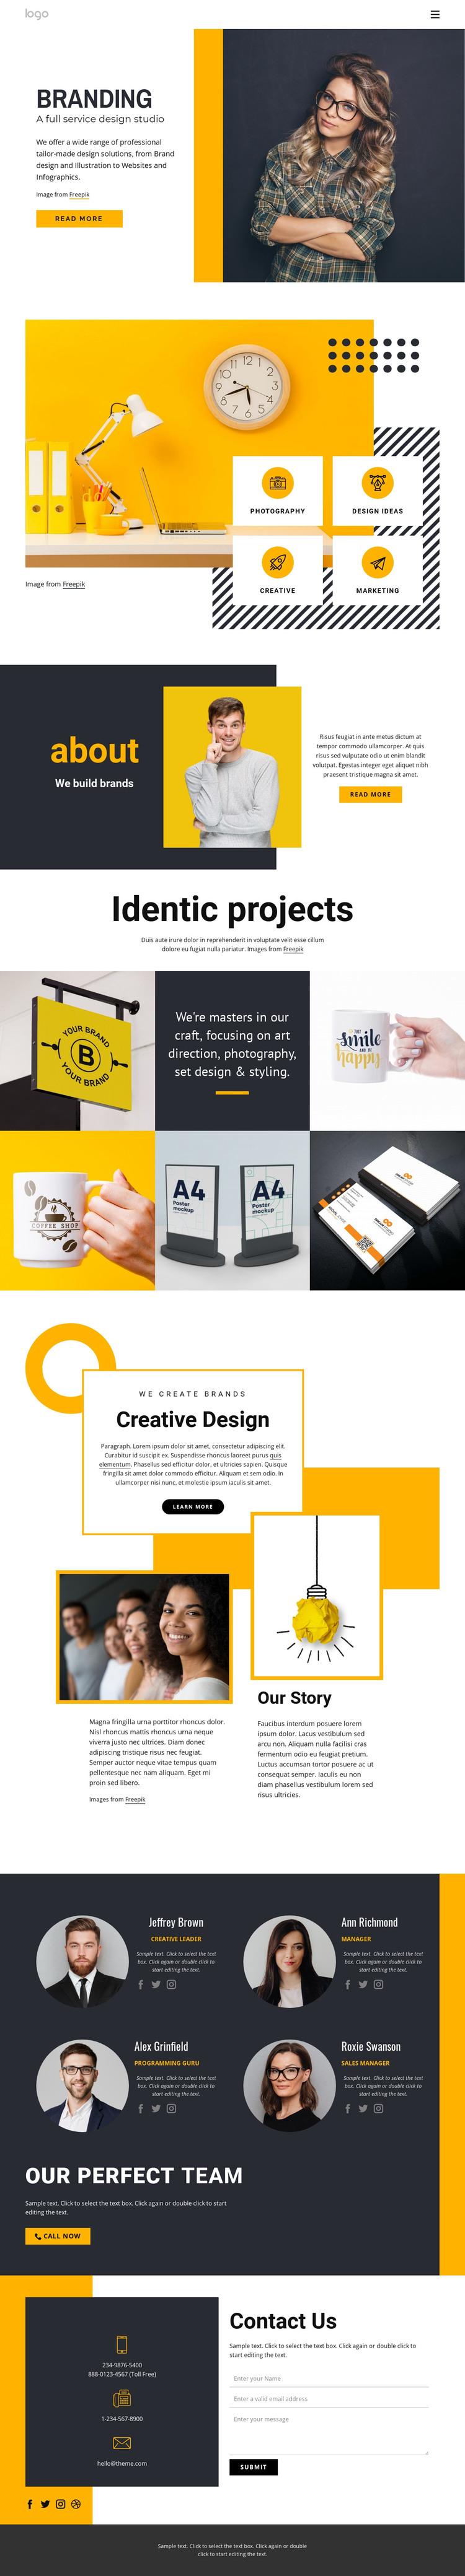 Full-service design studio WordPress Theme